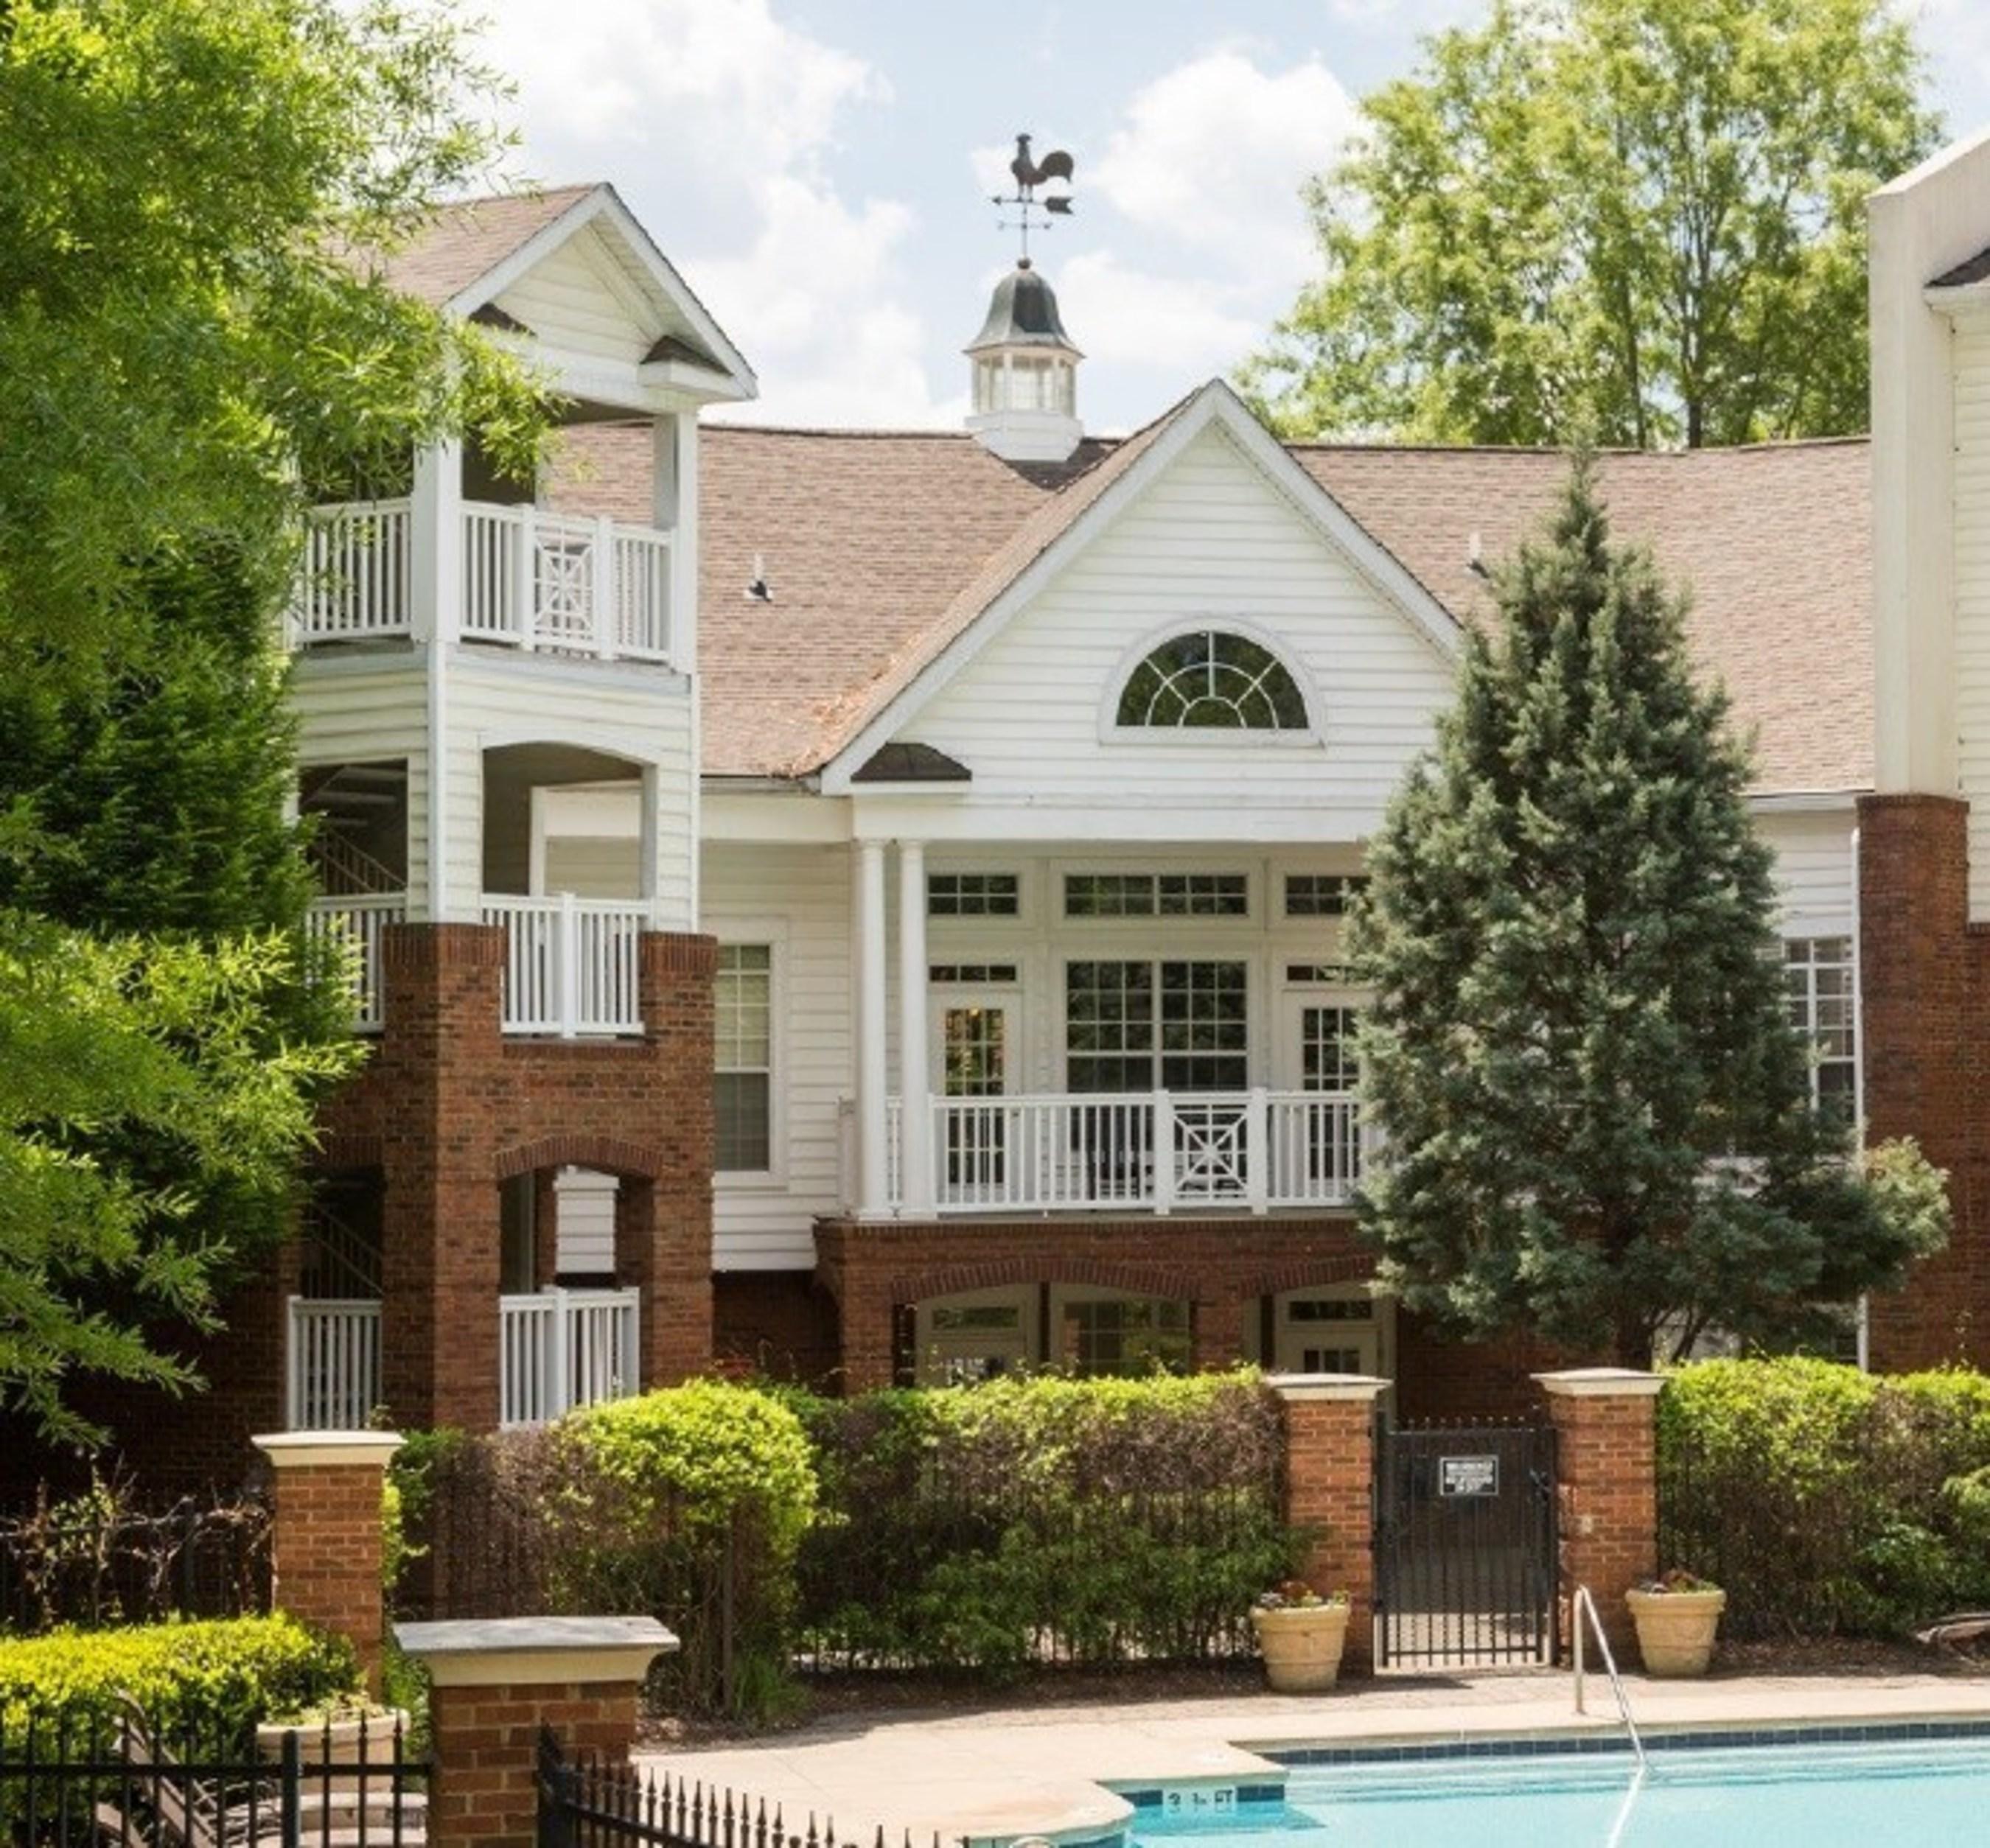 Morgan Creek Apartments: Spirit Bascom Ventures Acquires 232-Unit Apartment